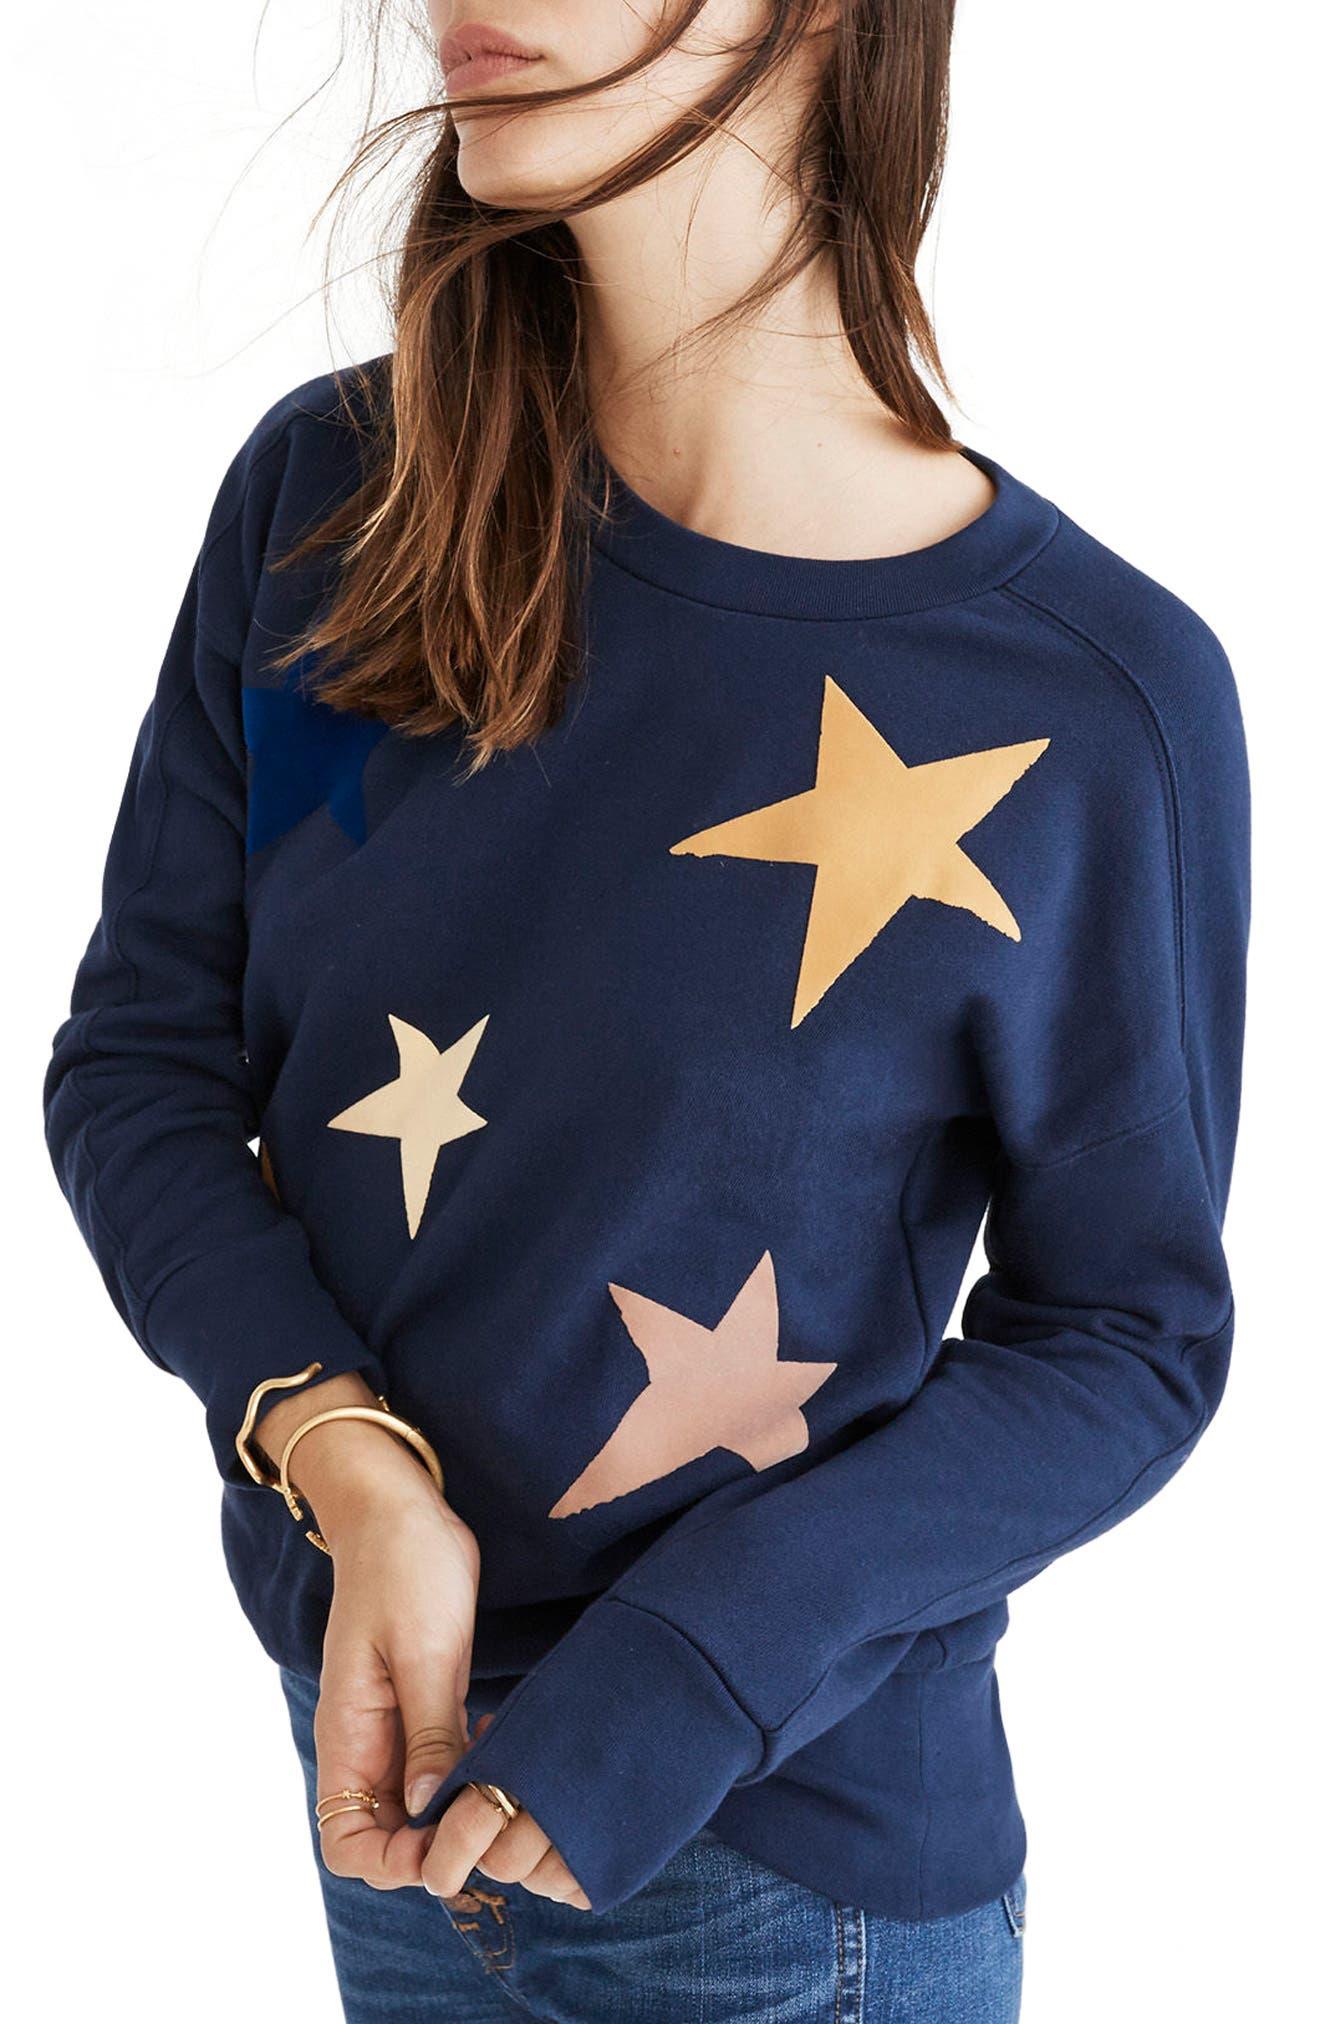 Starry Sweatshirt,                         Main,                         color, 410